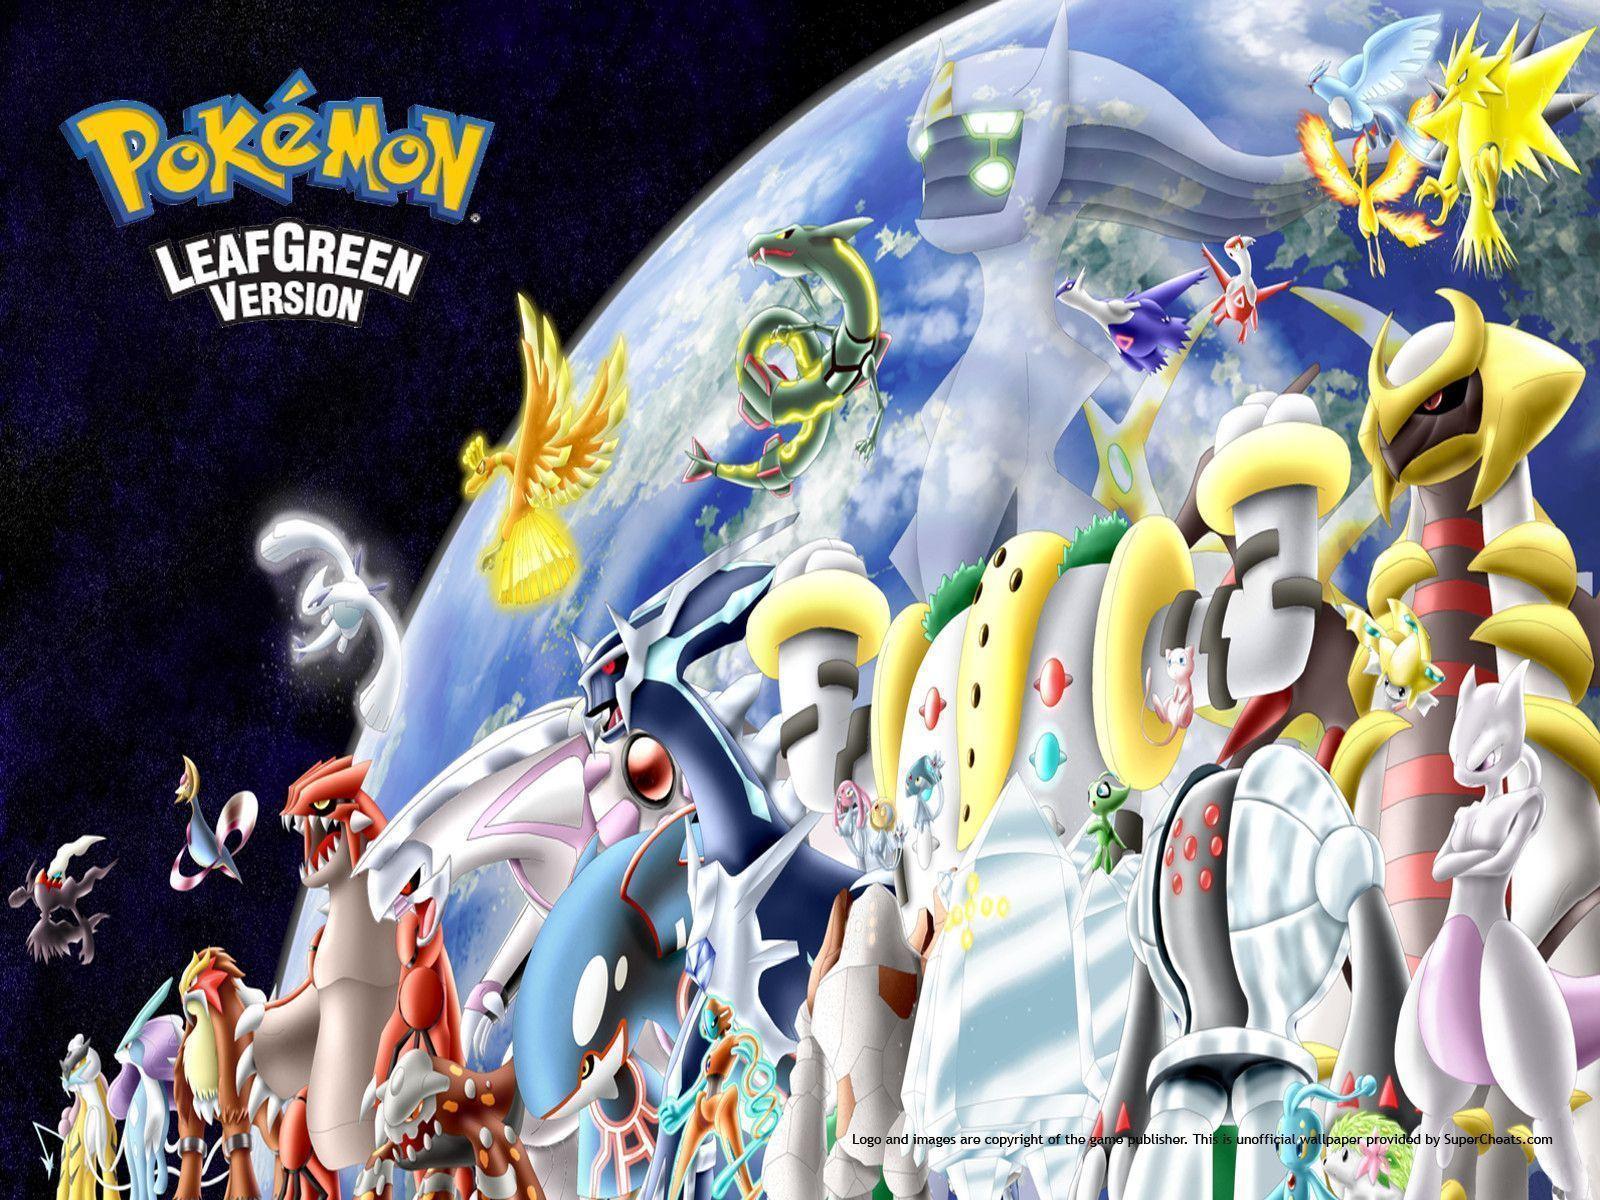 Cool Pokemon Backgrounds